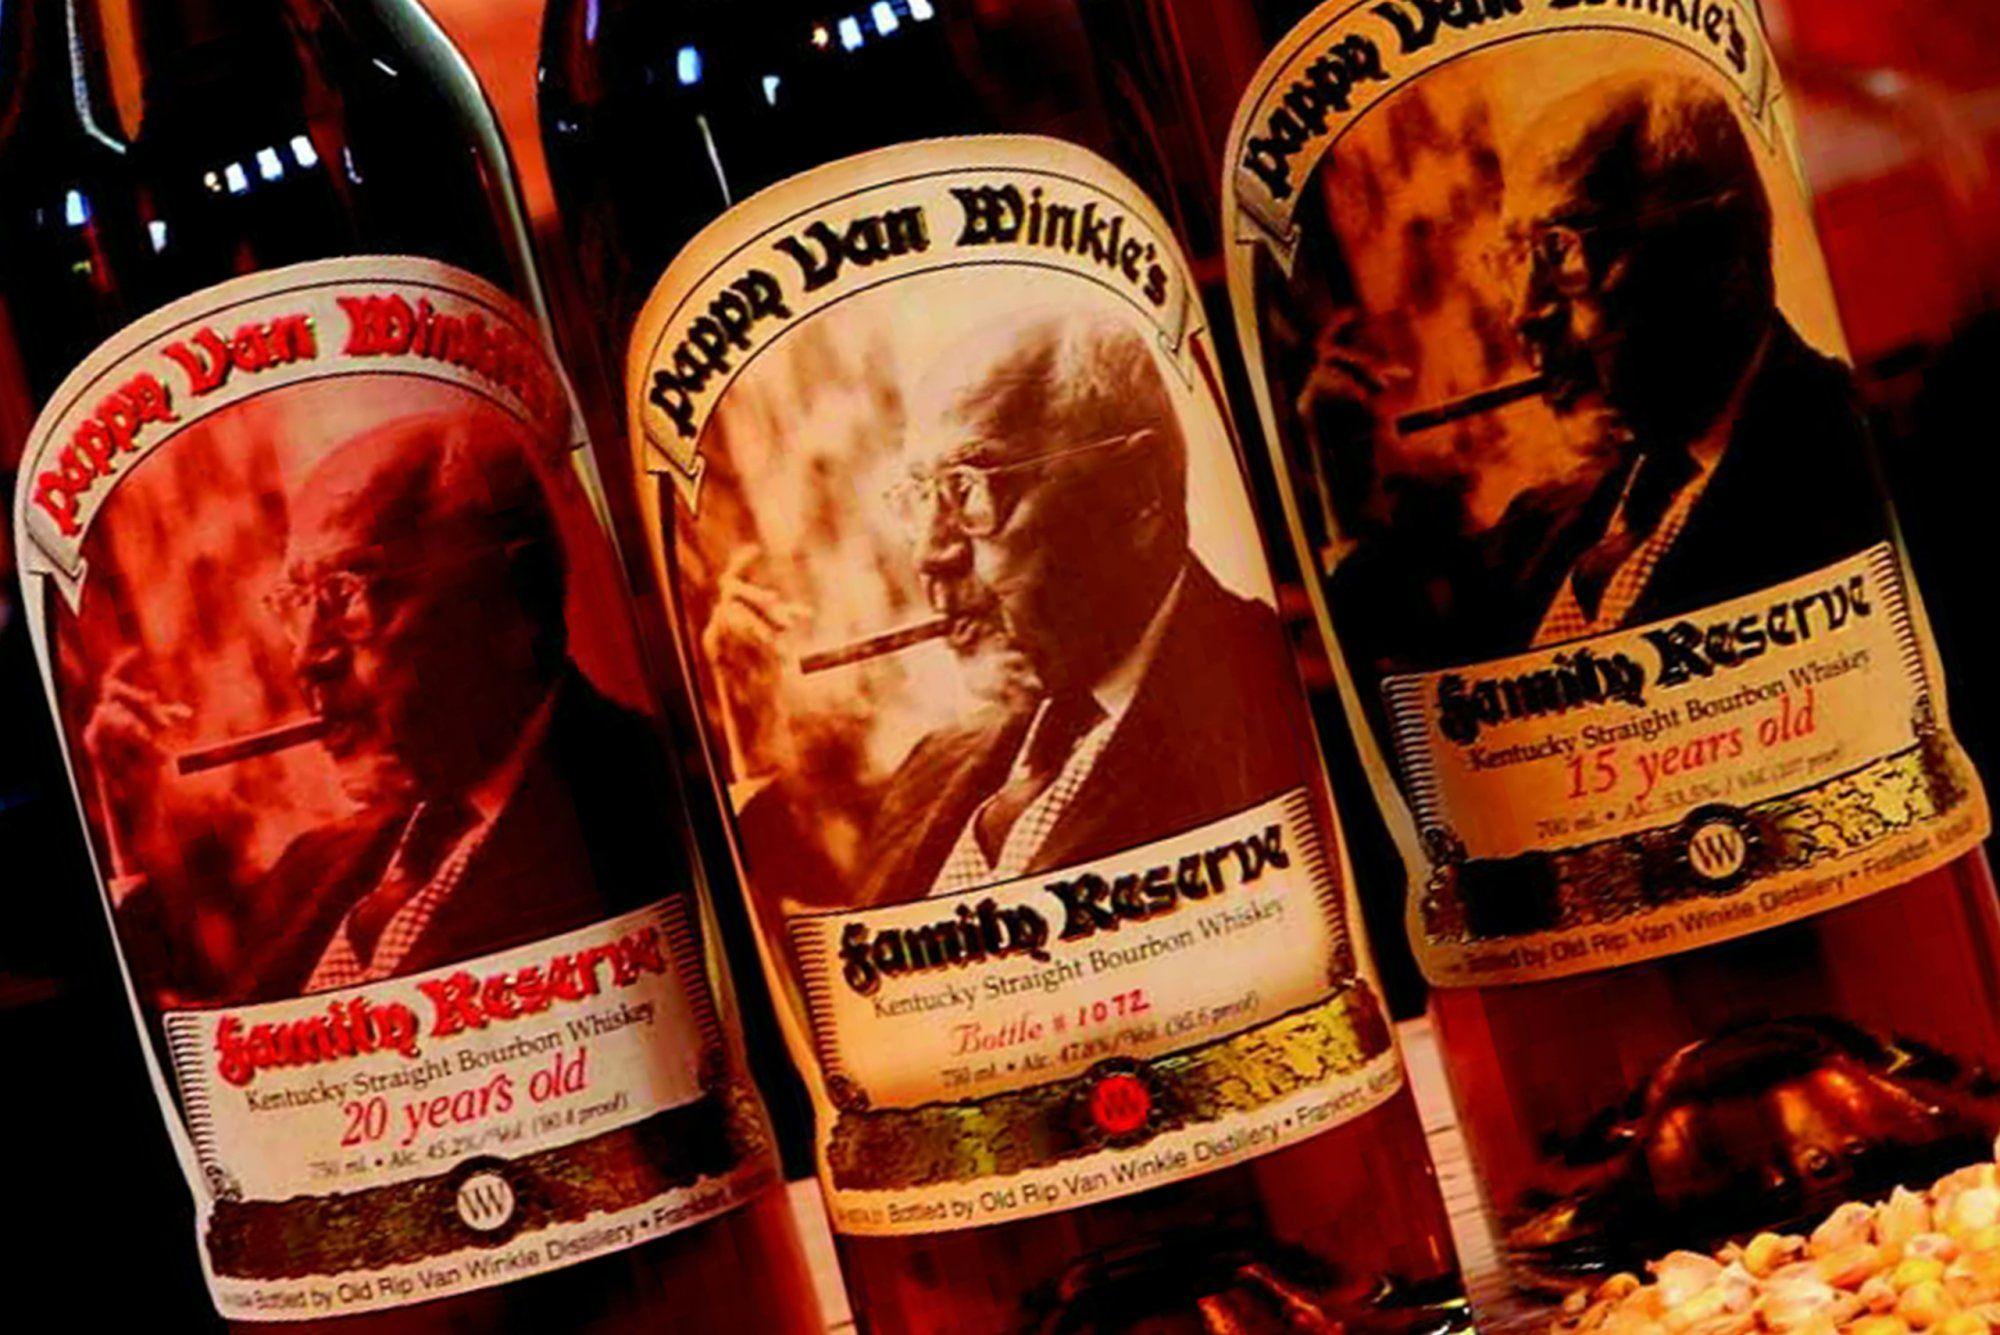 The Hunt For Pappy Van Winkle Whisky Bourbon Straight Bourbon